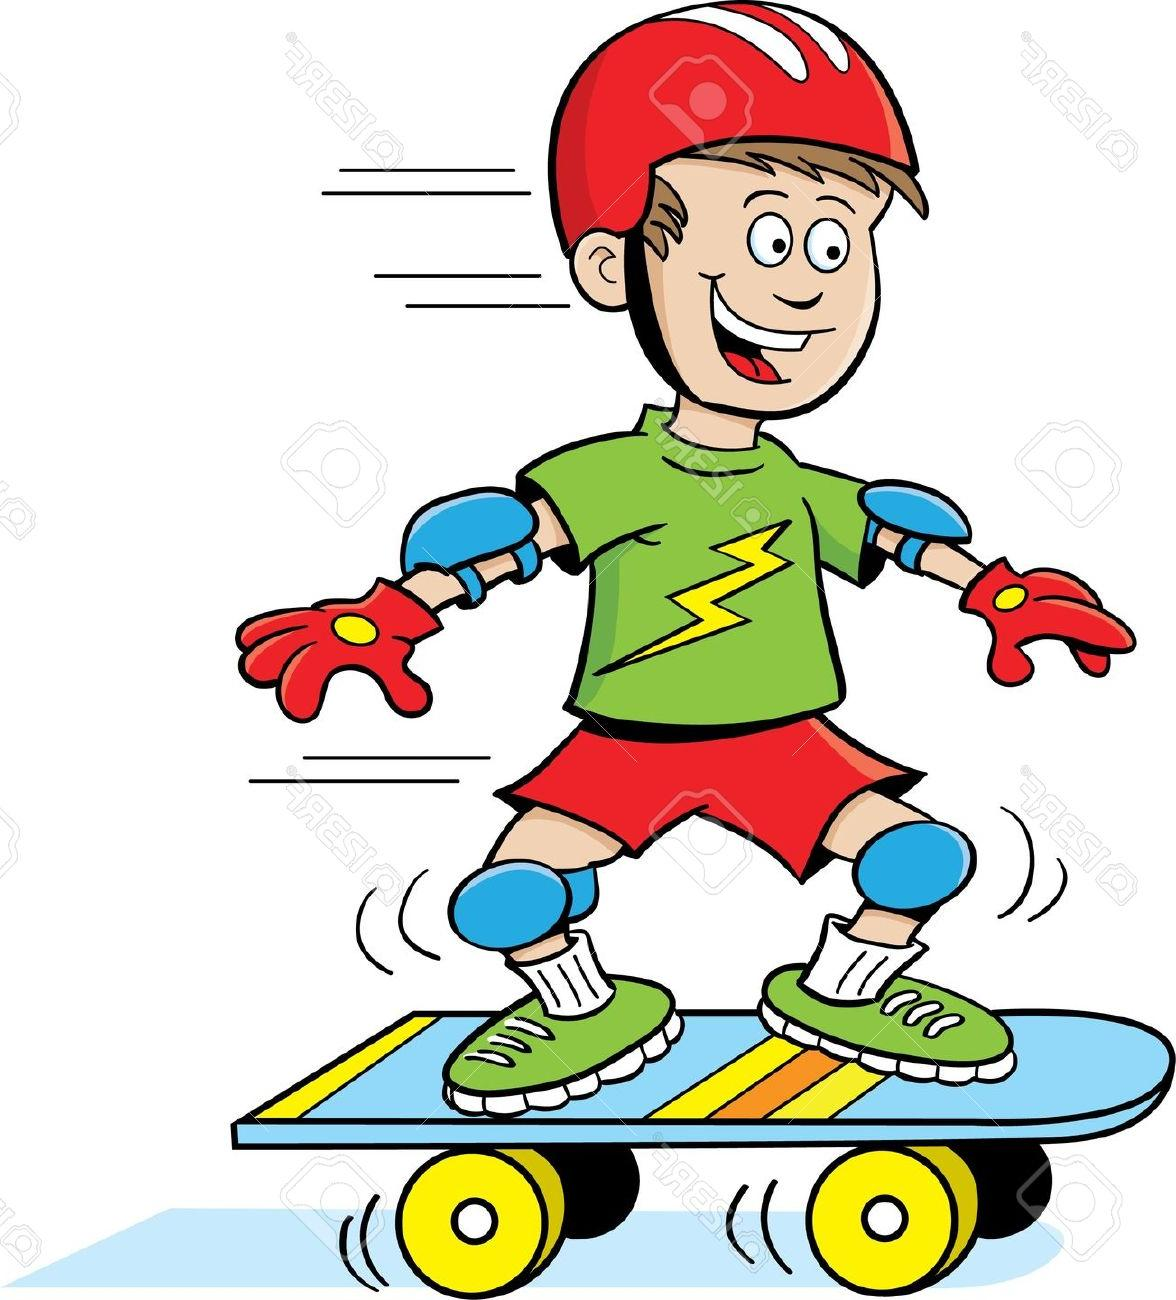 Top Cartoon Skateboard Clip Art Pictures » Free Vector Art.